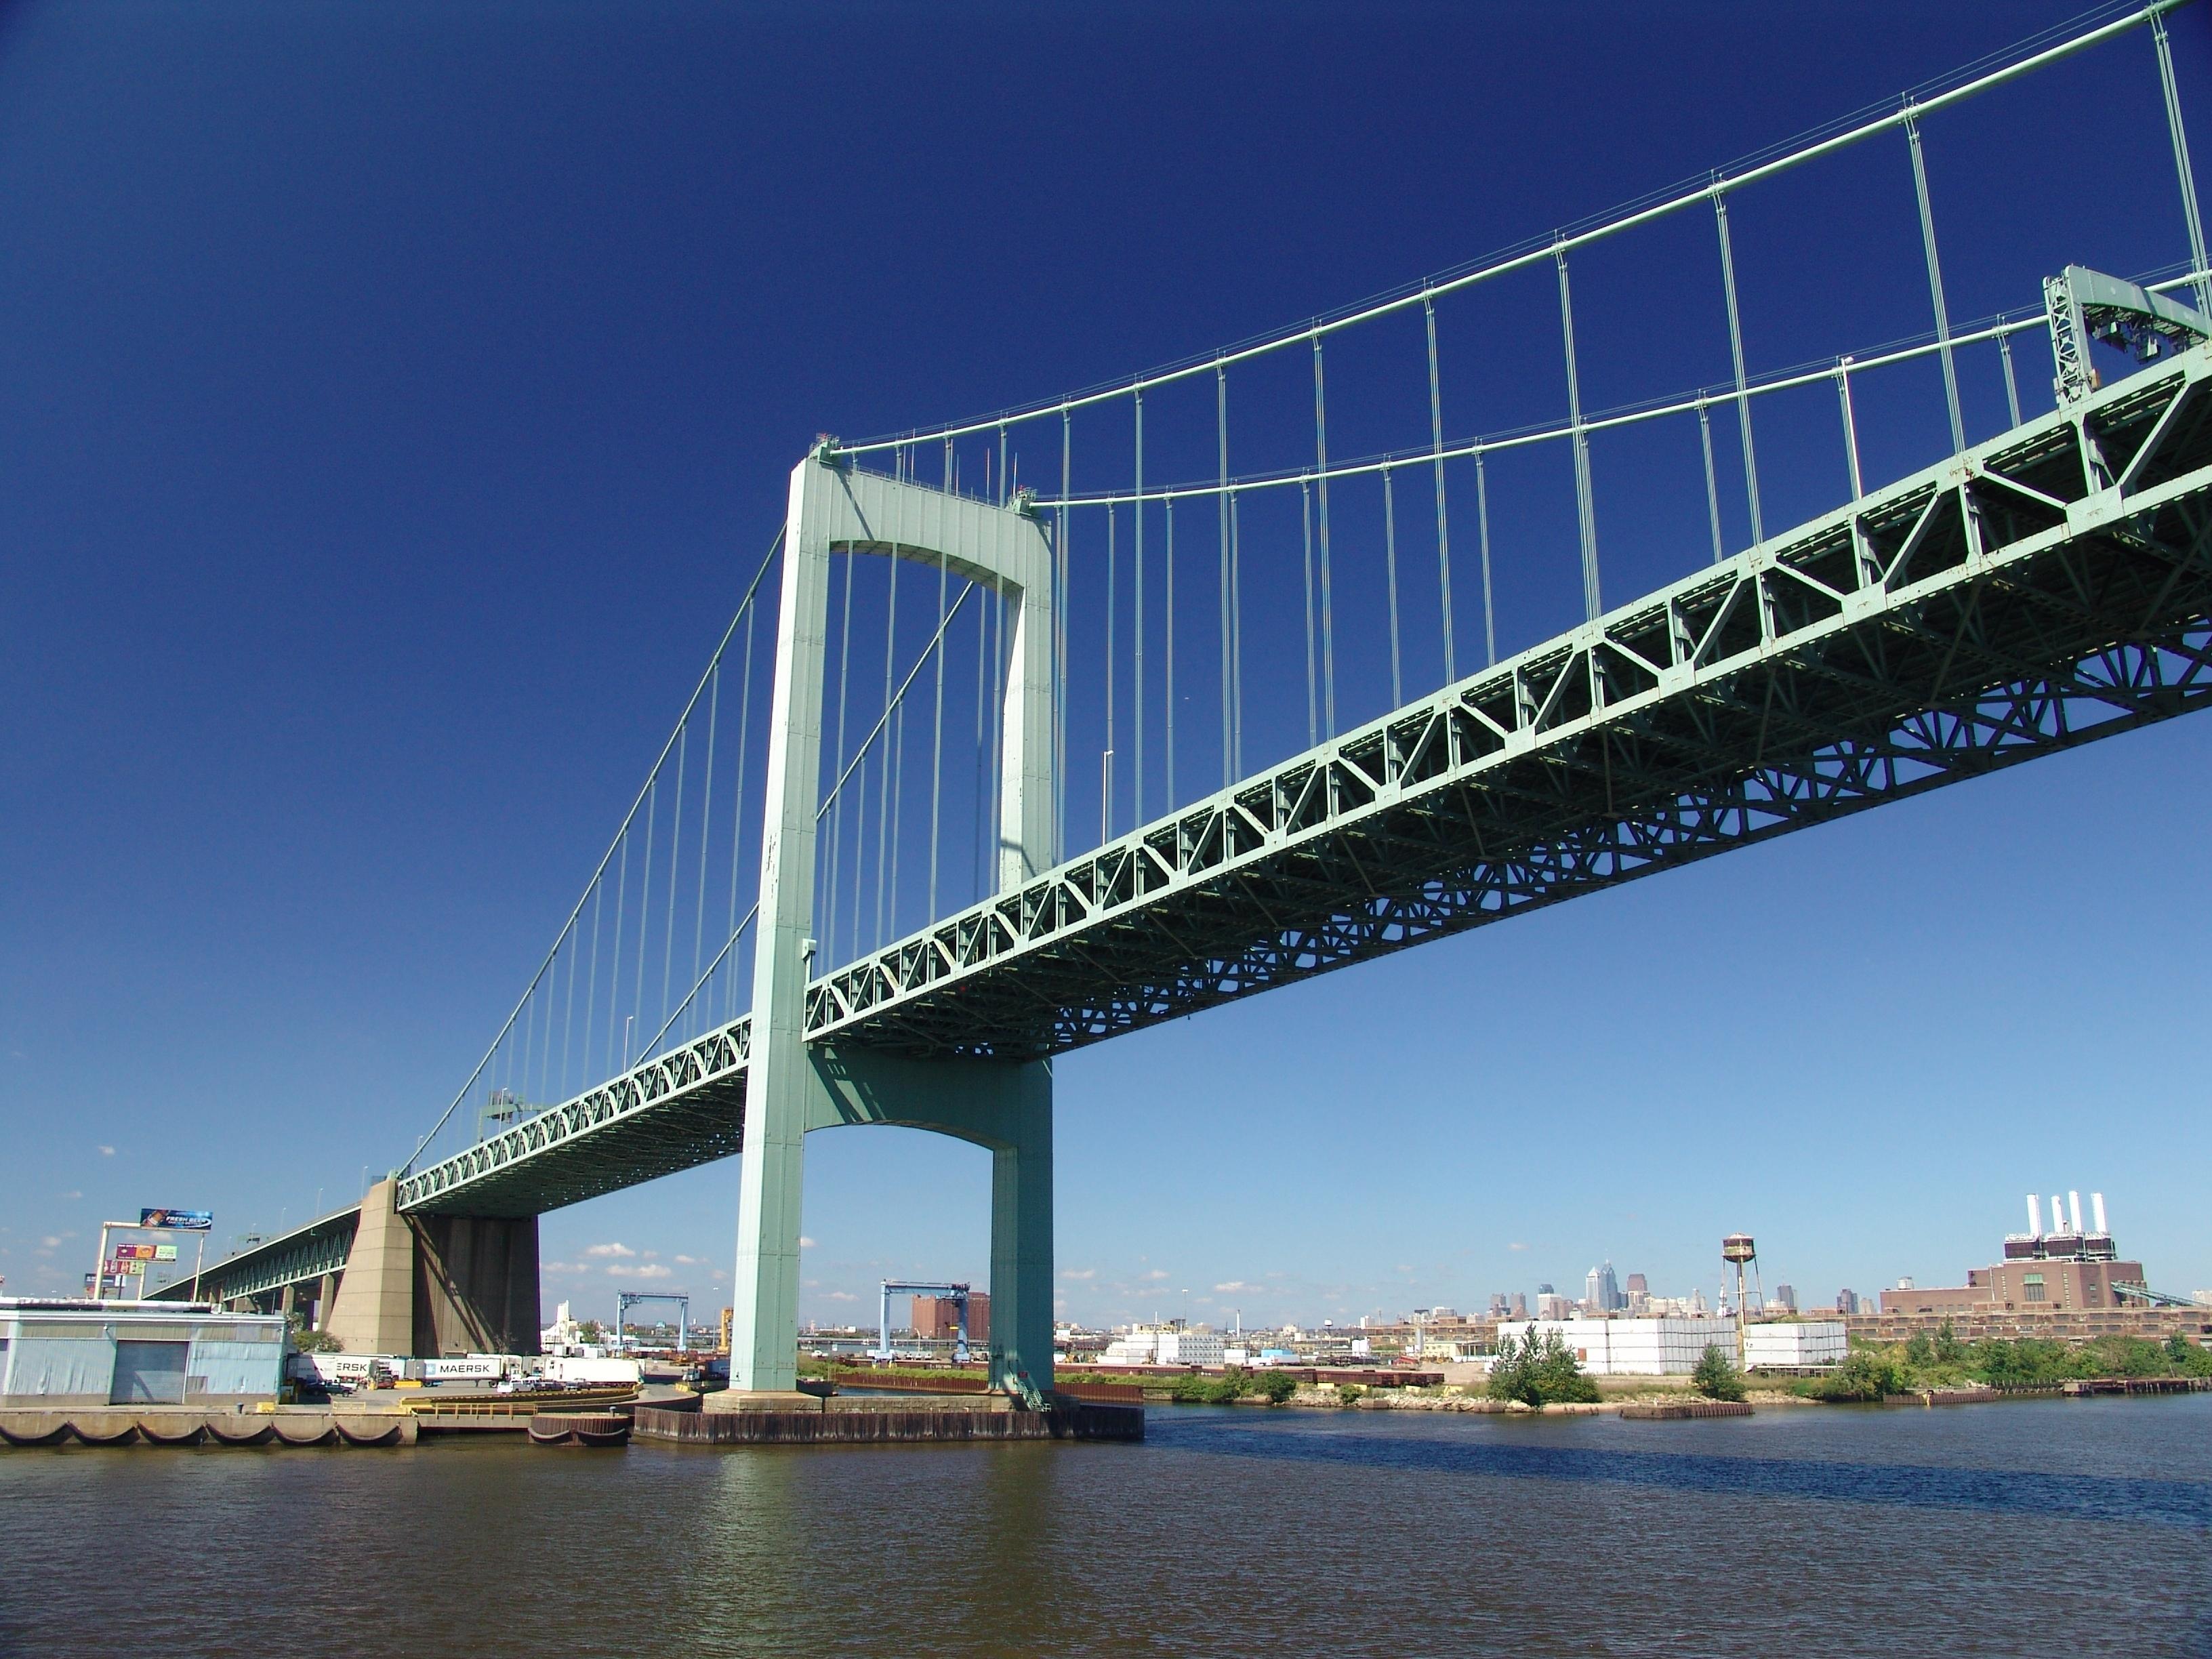 Modjeski And Masters To Inspect Walt Whitman Bridge